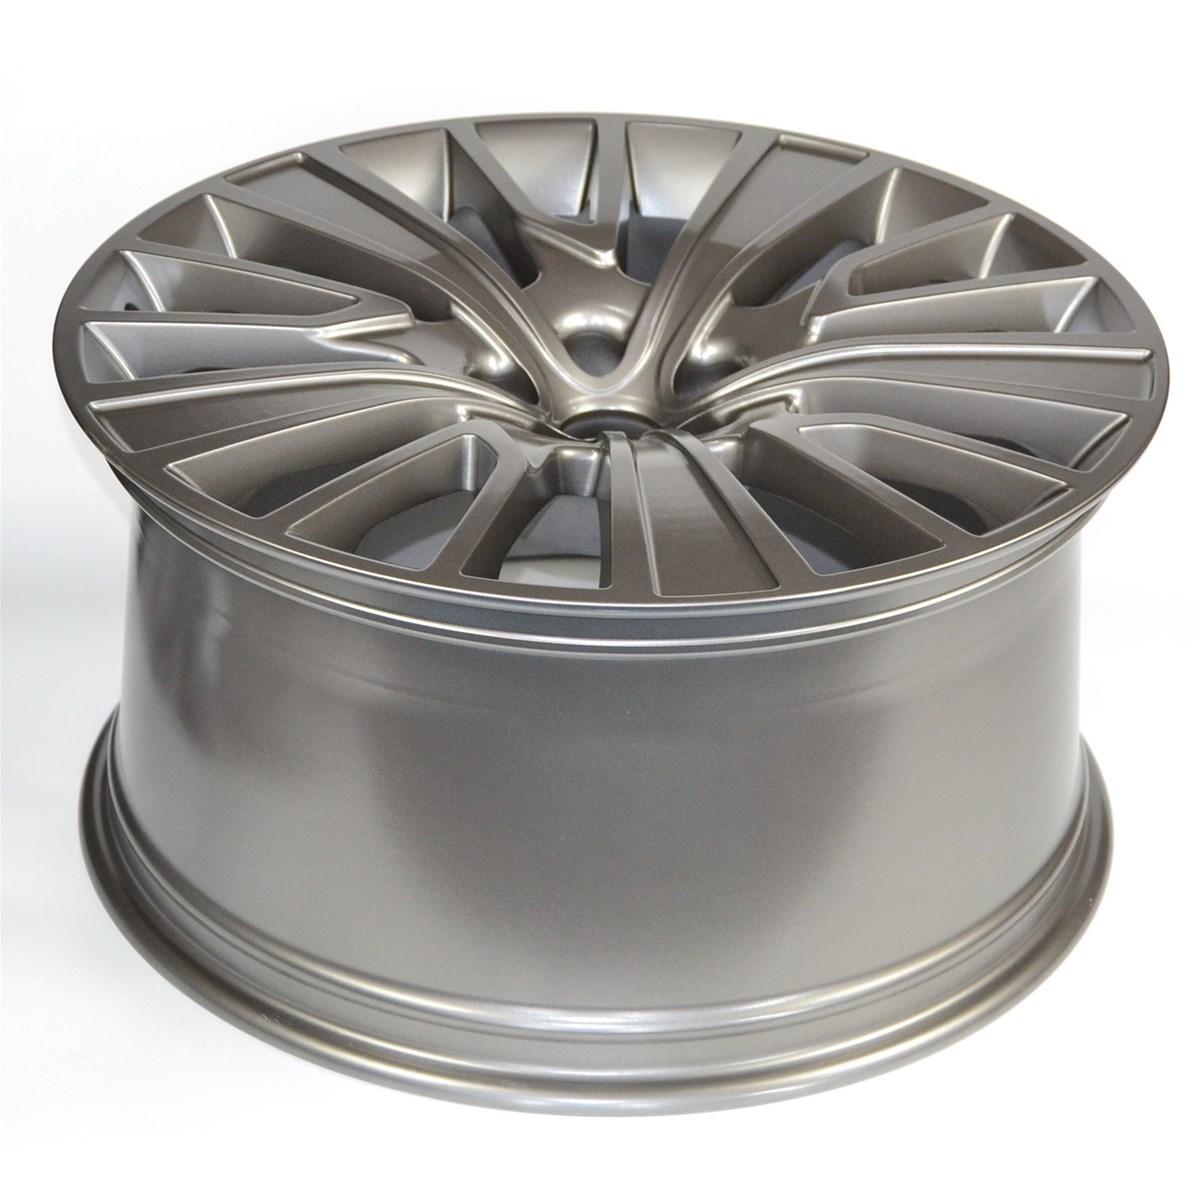 Hot sale 5x1143 aluminum wheels chrome alloy wheels